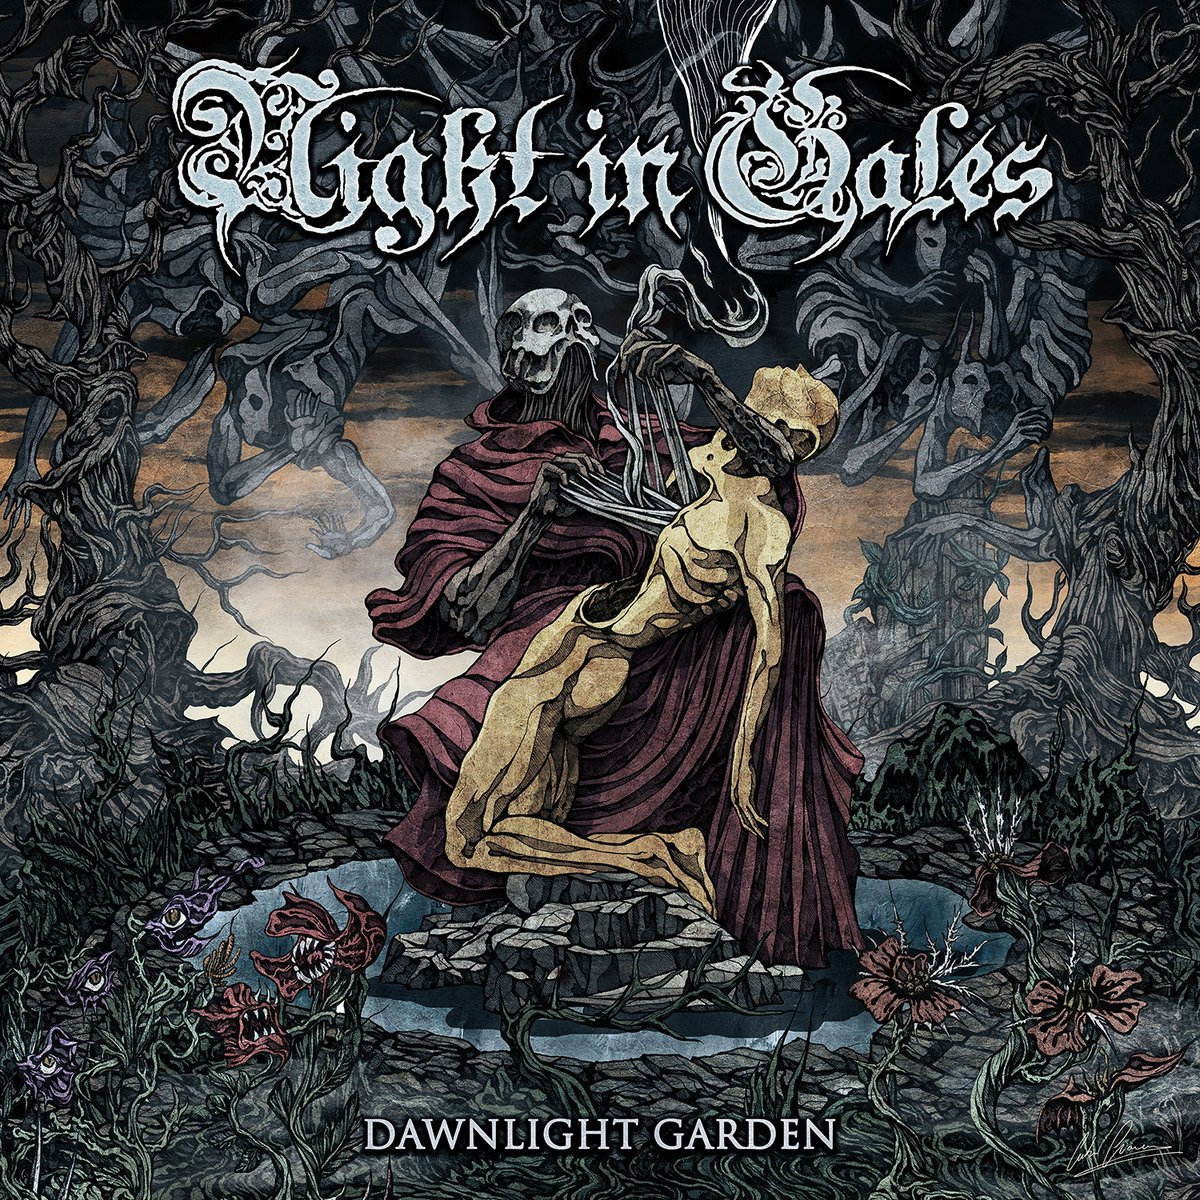 Night In Gales – Dawnlight Garden